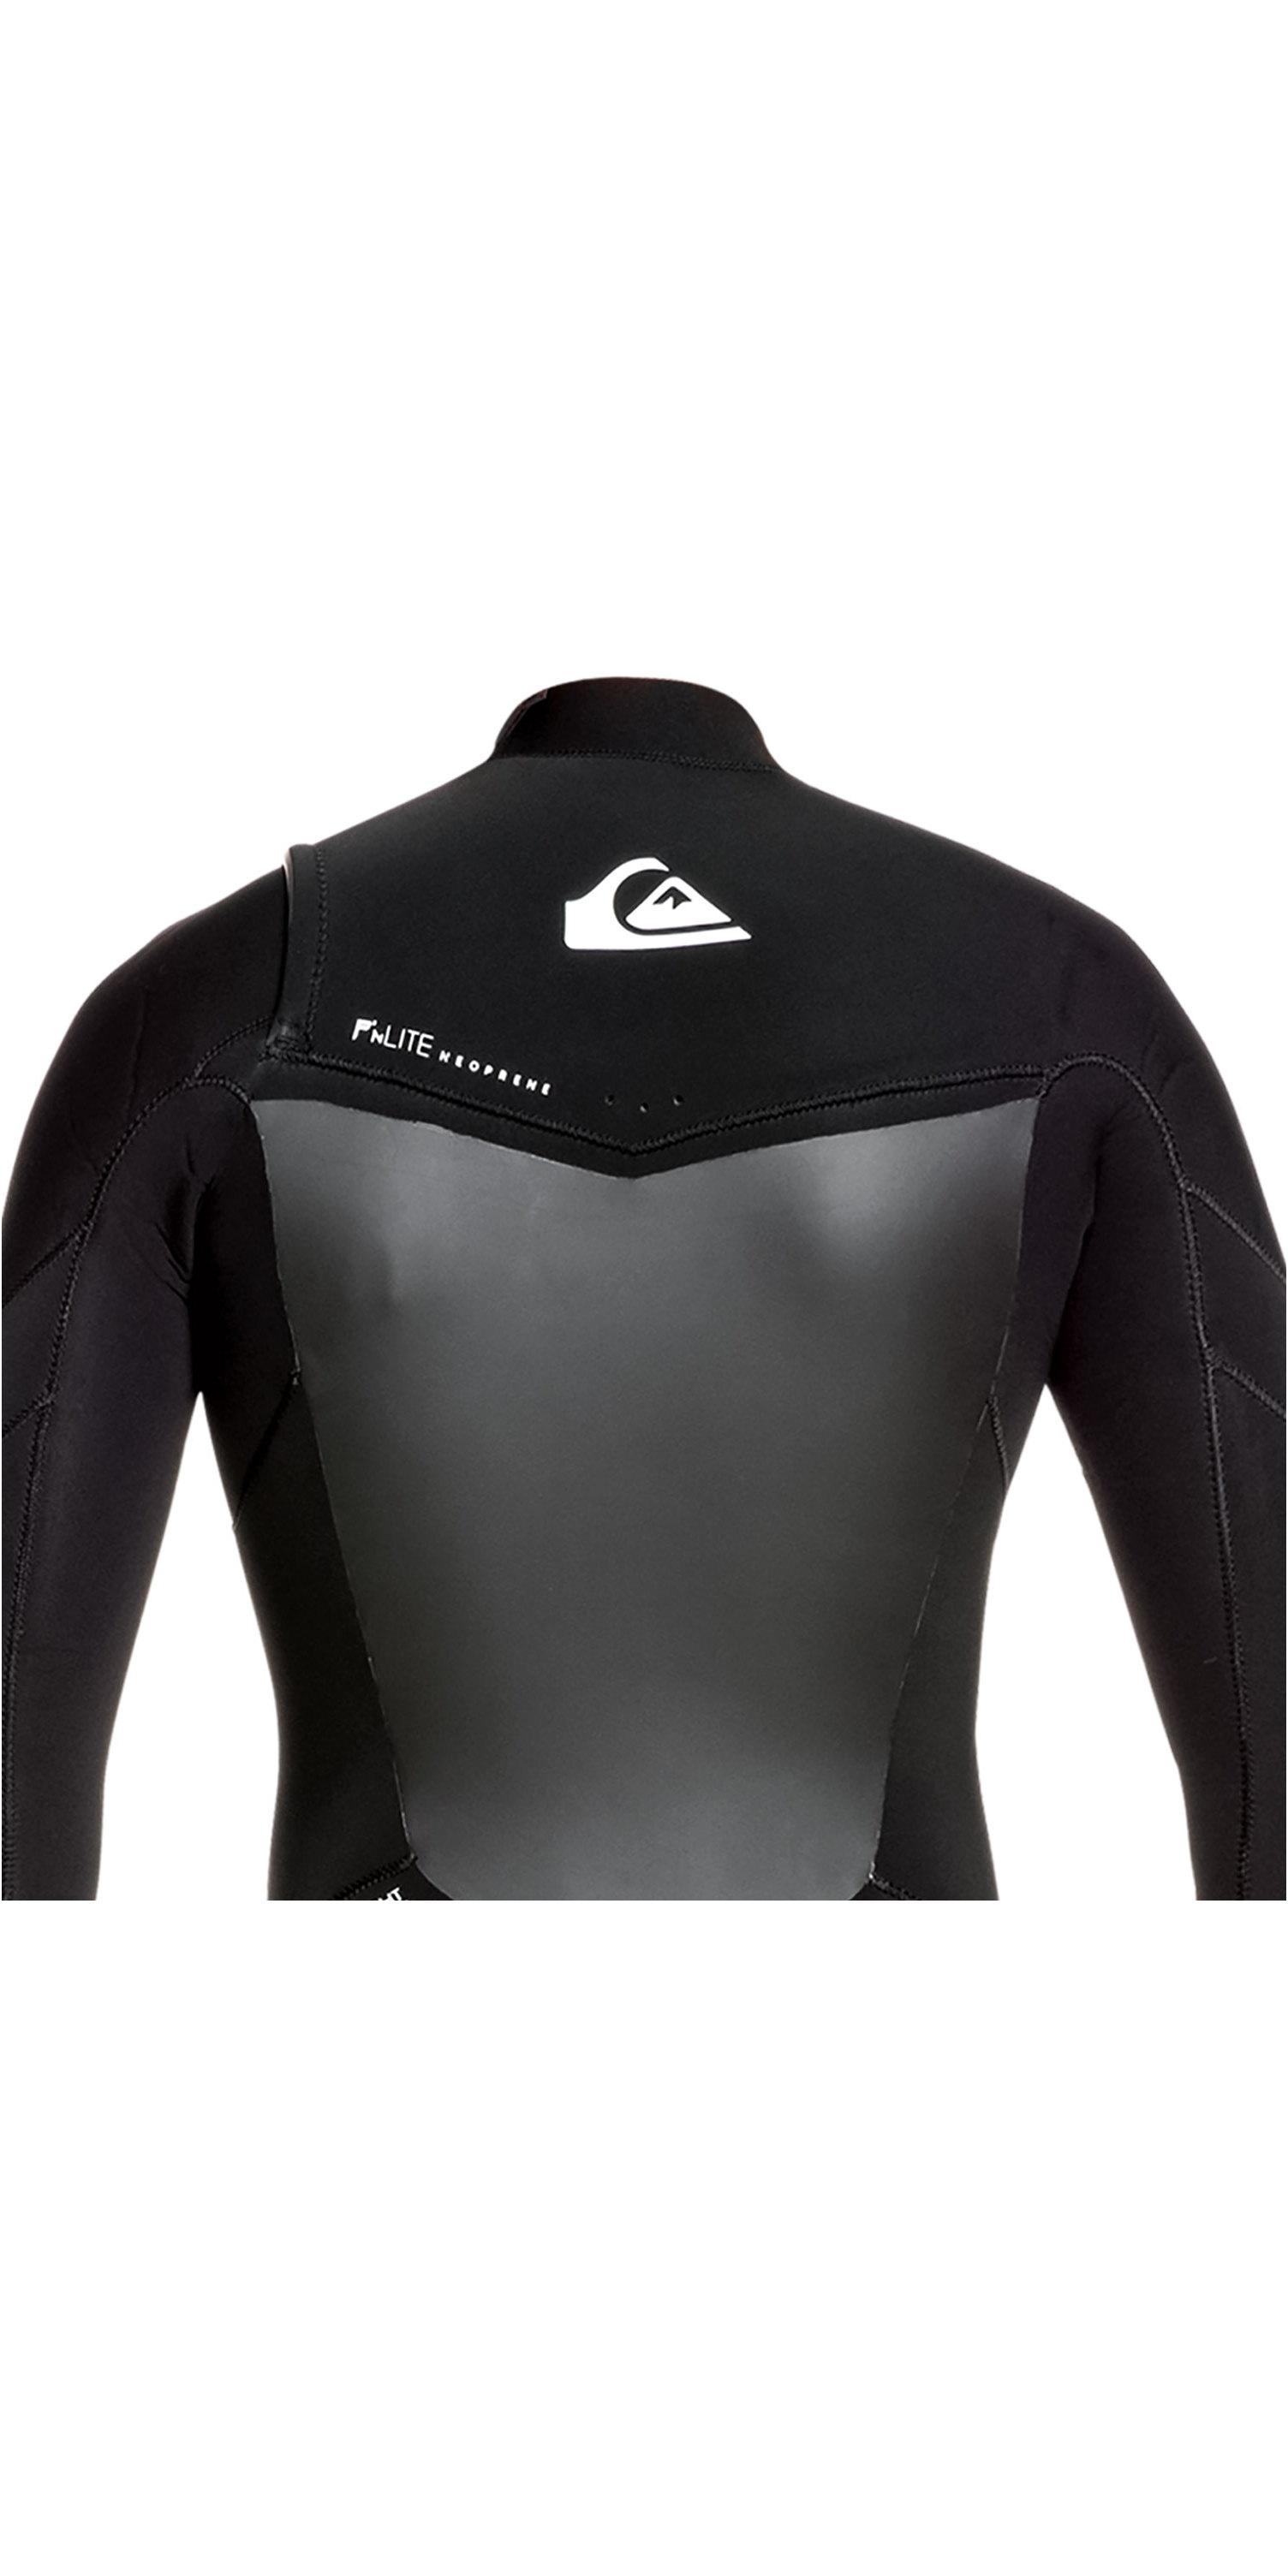 2019 Quiksilver Mens Syncro 5/4/3mm Chest Zip Wetsuit Black / White EQYW103089